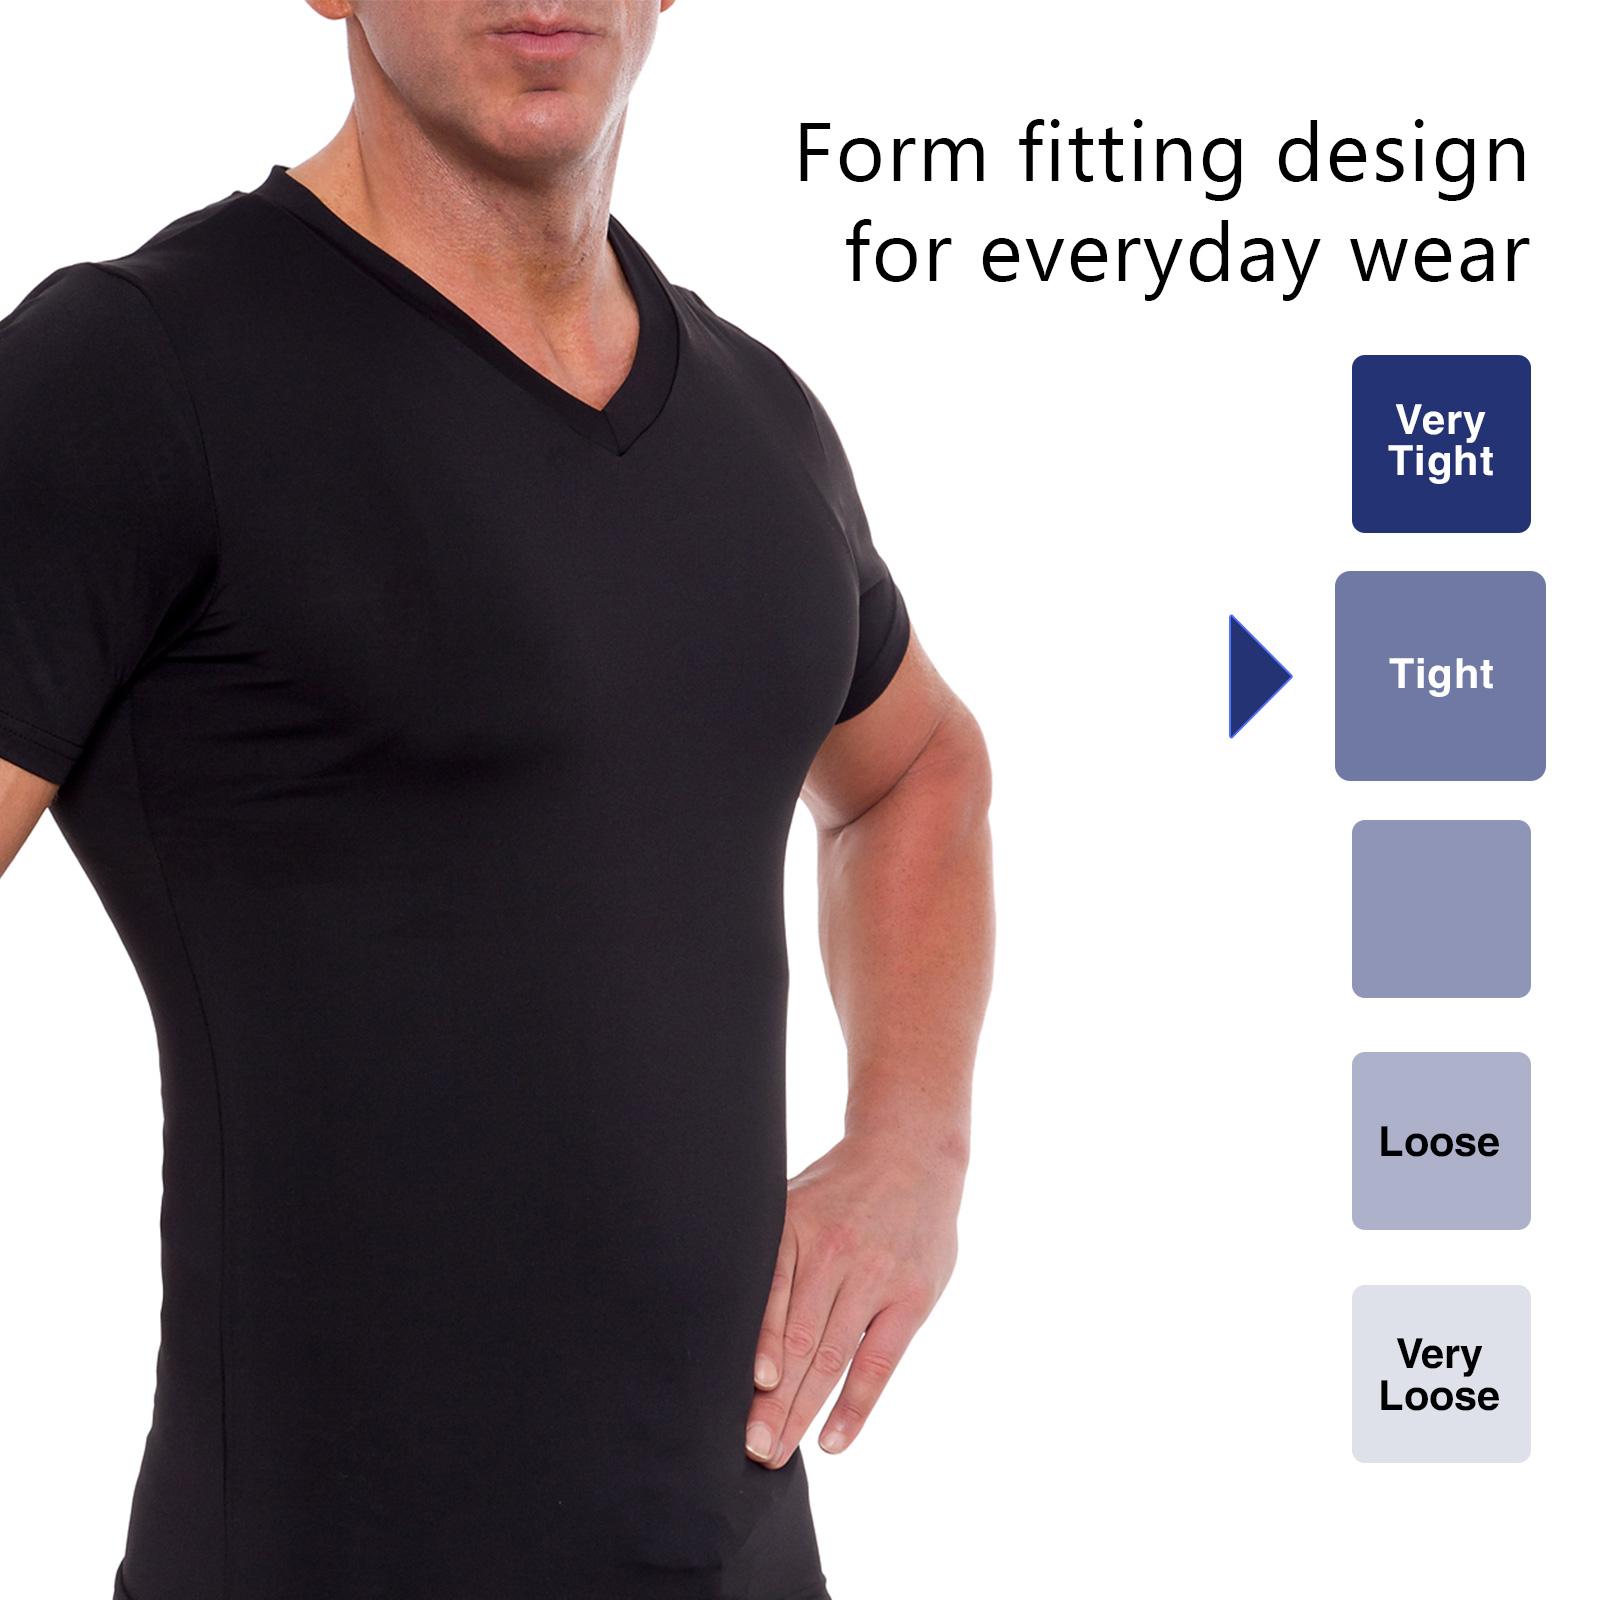 73c3cbe81bb74 LISH Men s Black Slimming Compression Body Shaper Gynecomastia V-Neck Shirt  (Medium)